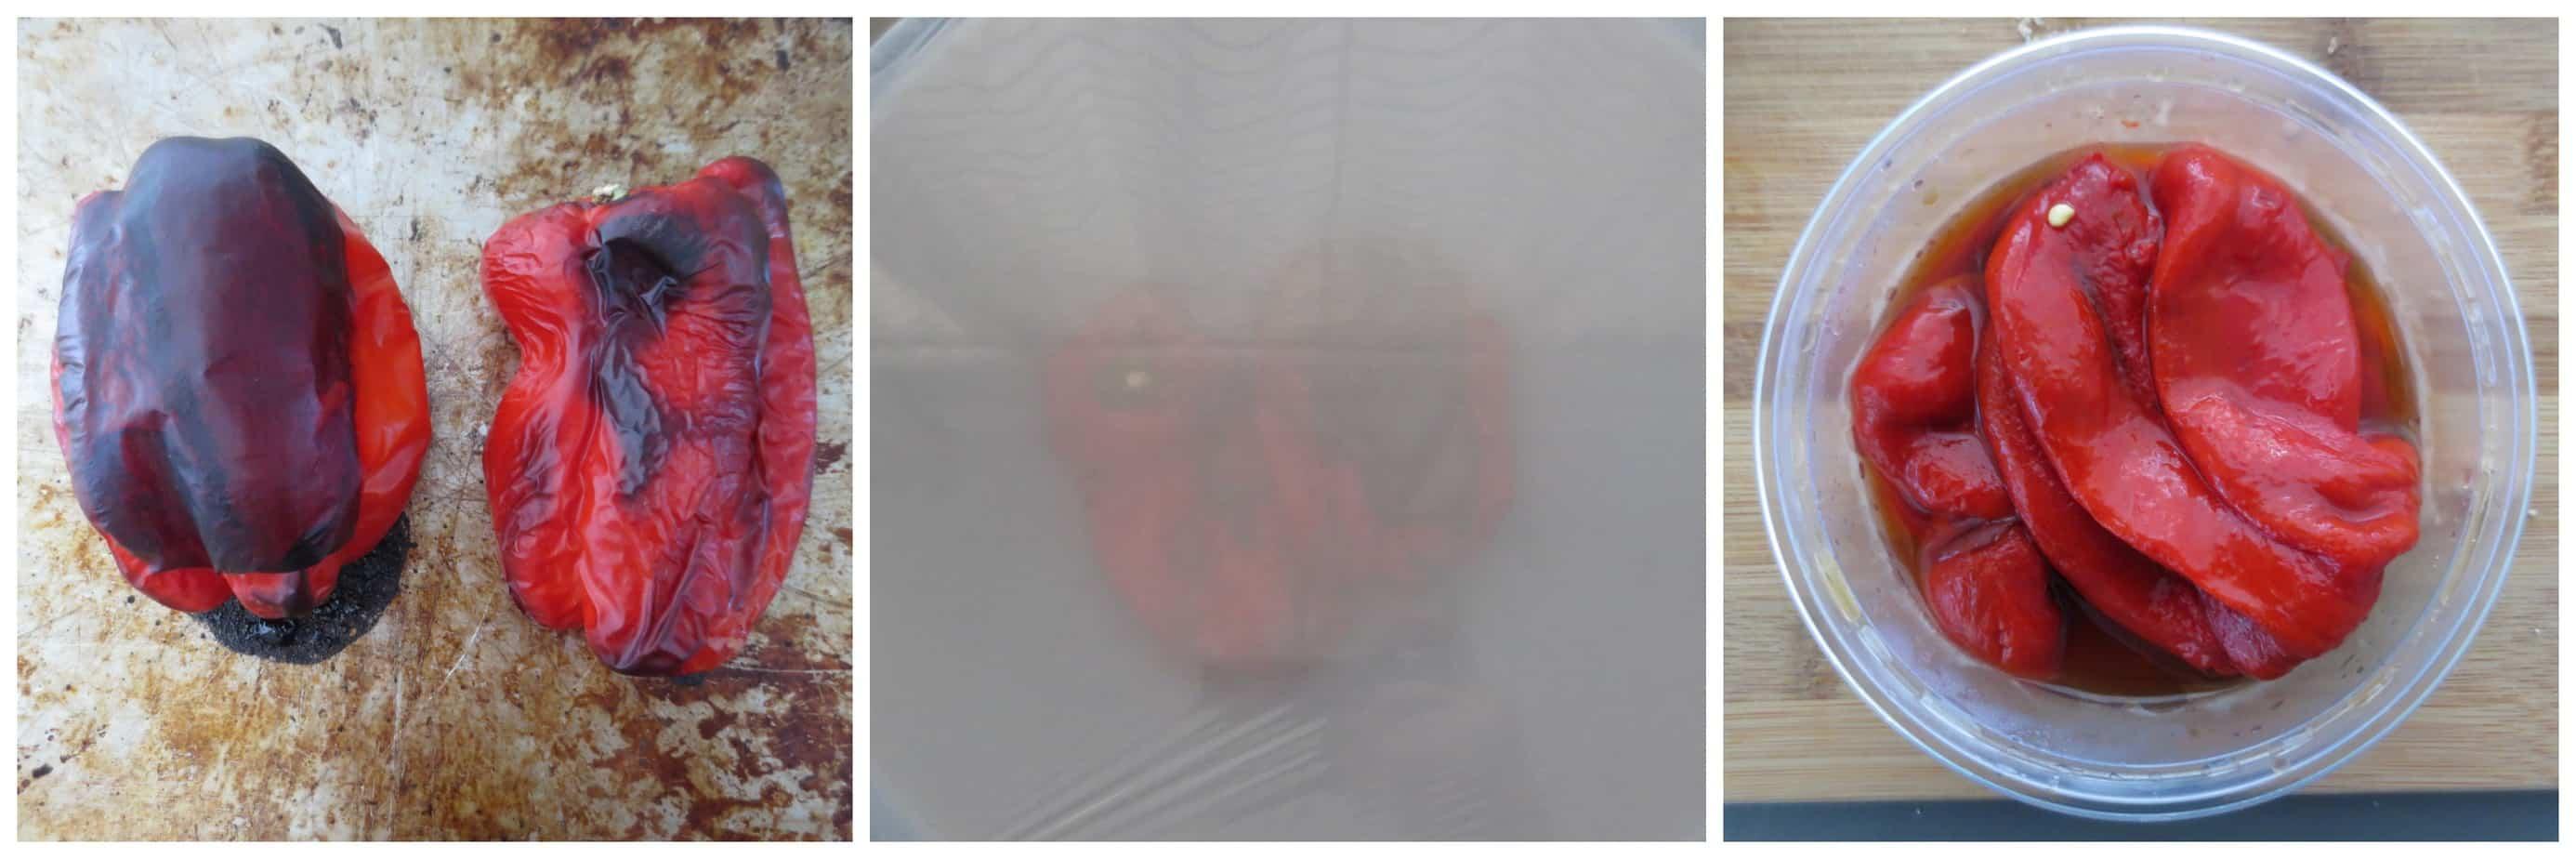 Roasted Red Peppers.jpg